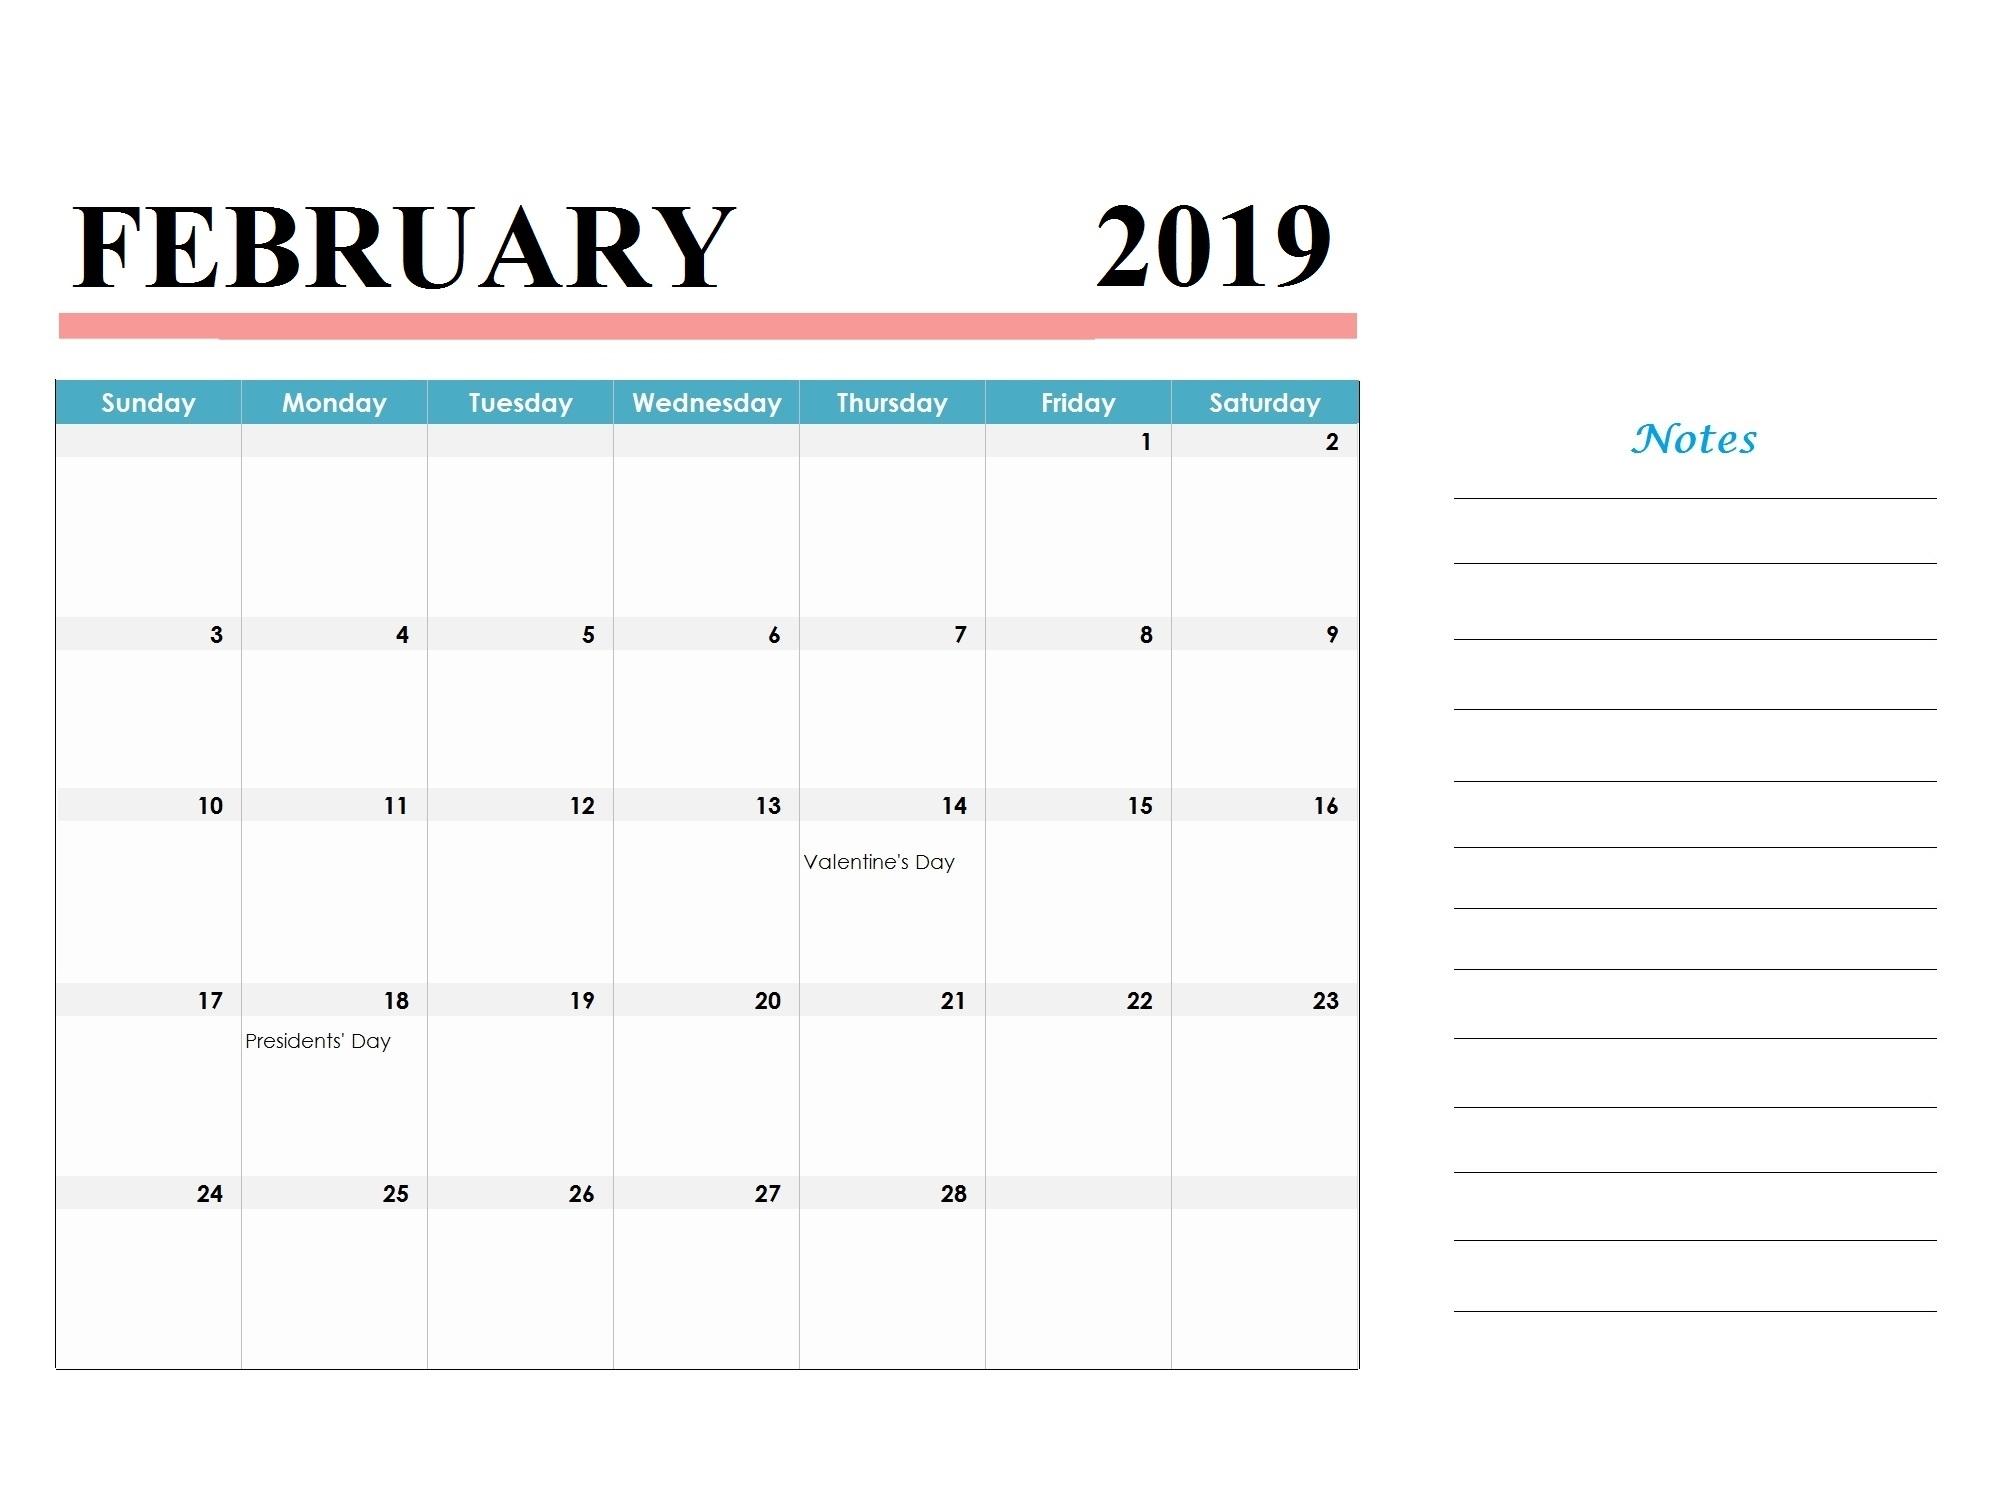 monthly 2019 holidays calendar templates calendar::Monthly 2019 Holidays Calendar Templates